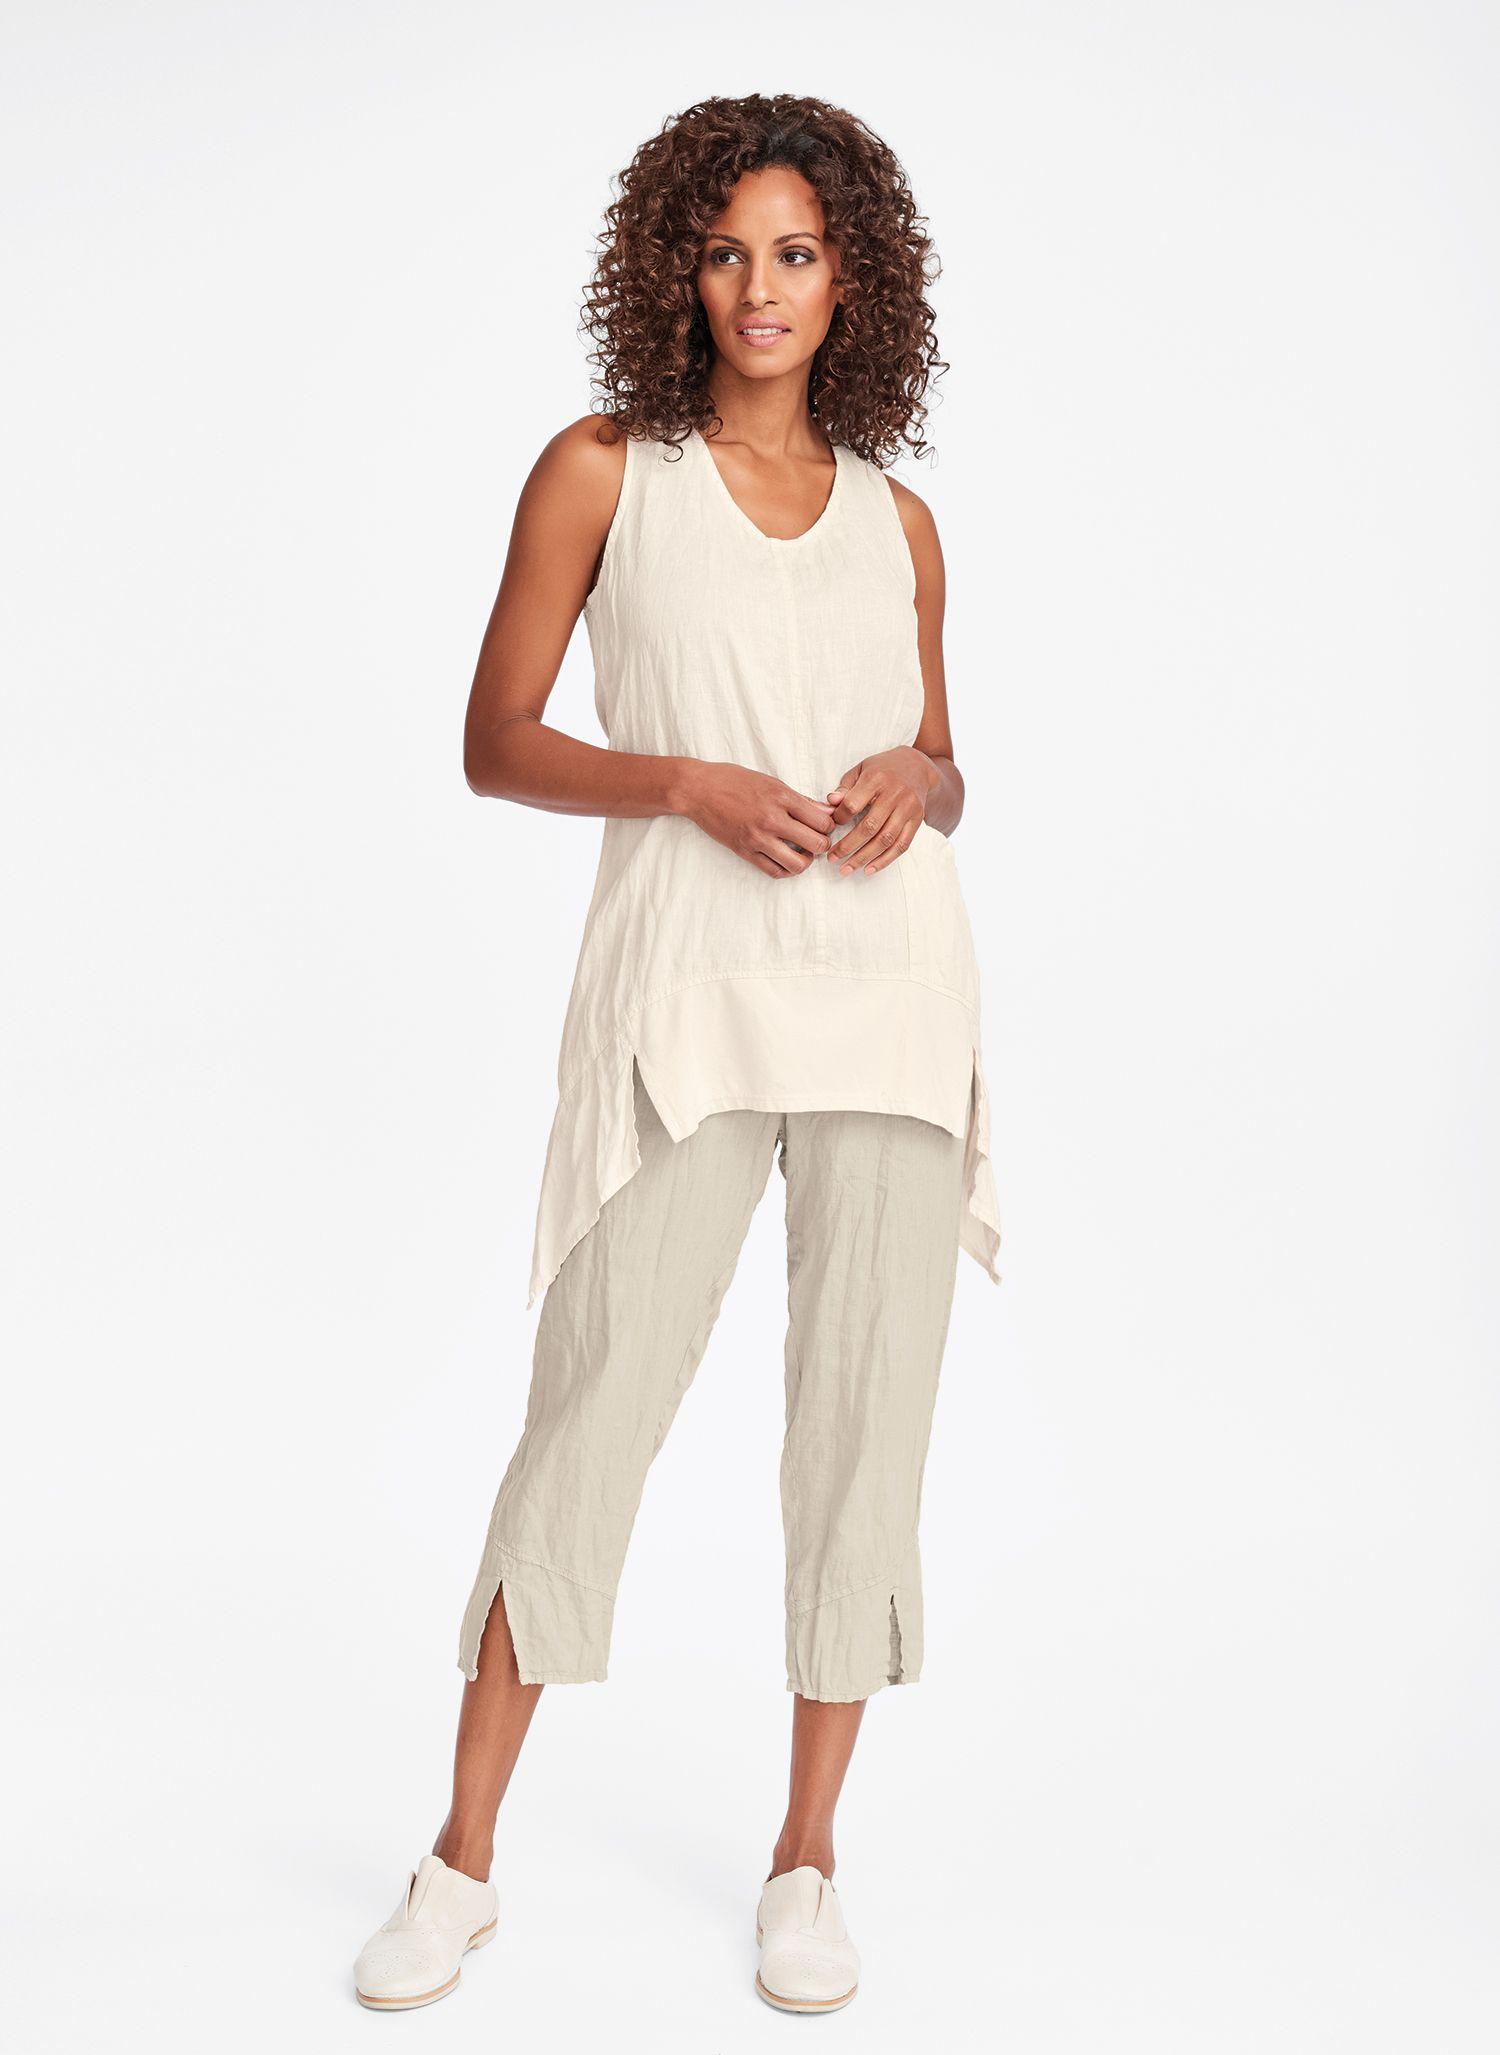 47e6324d094f2d Urban FLAX 2019 Womens Linen Clothing, Linen Pants, Spring Colors, Capri  Pants,